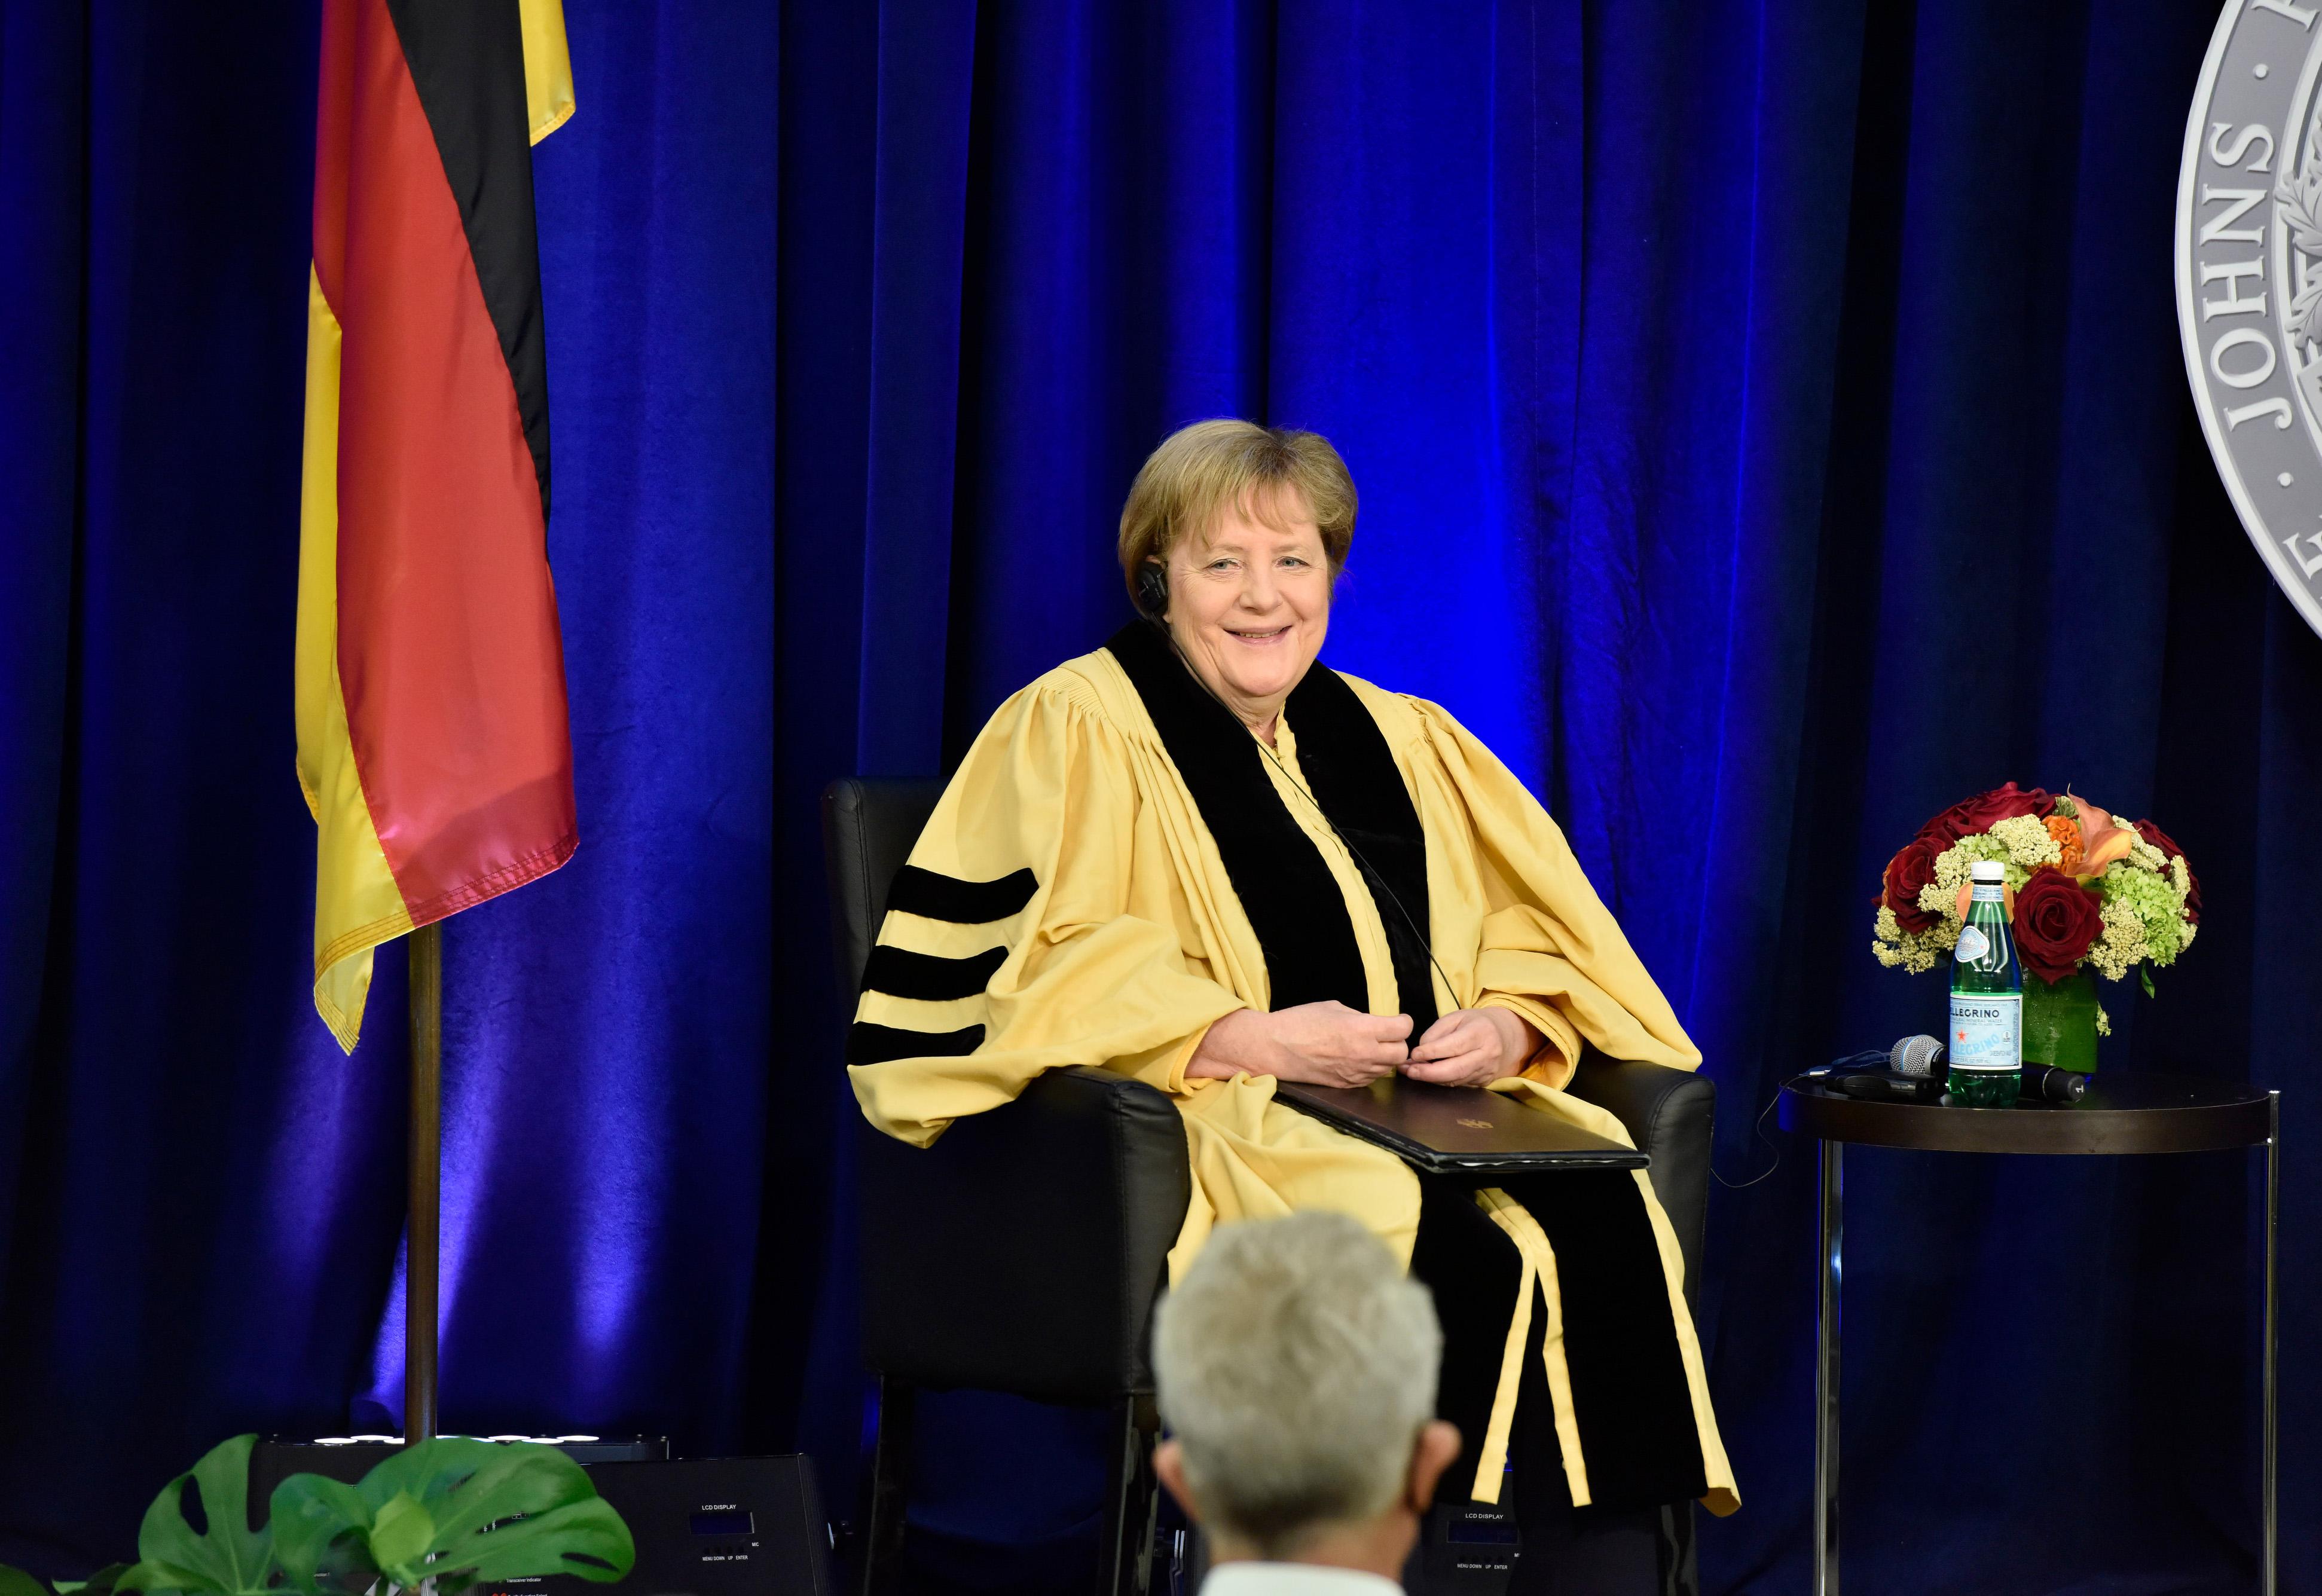 Angela Merkel smiles to the audience